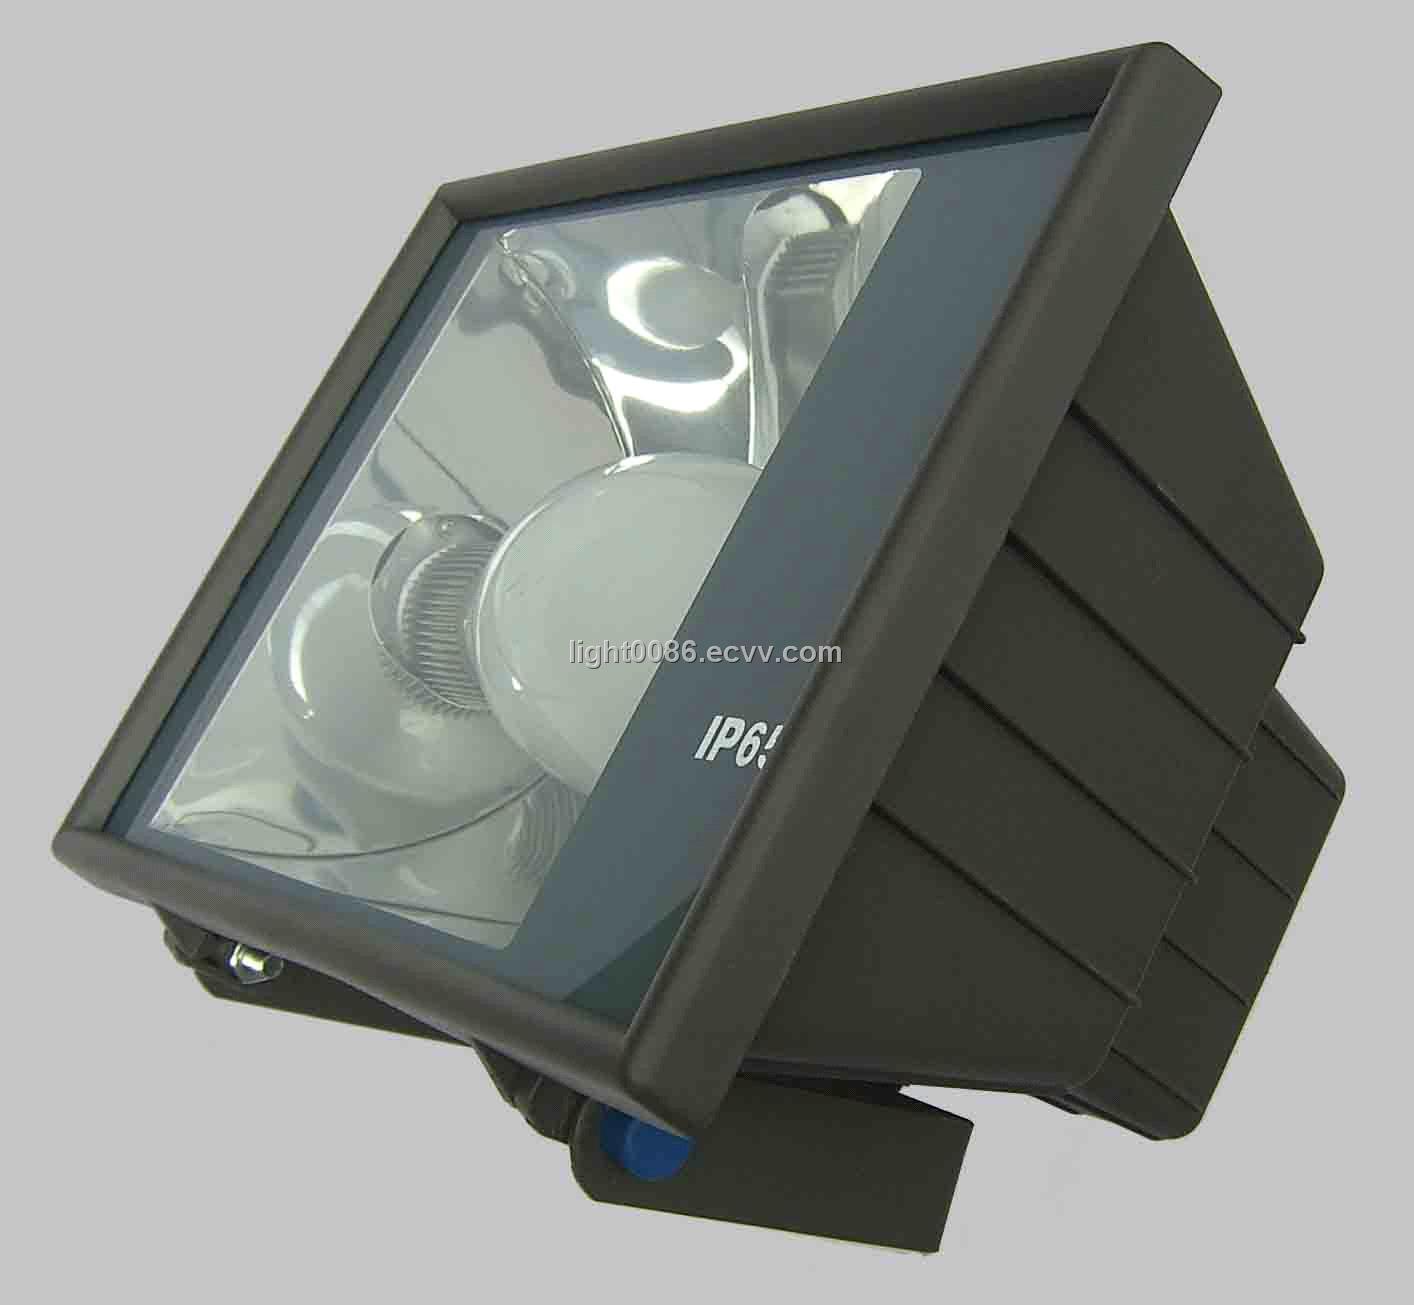 Energy Saving Floodlights : Energy saving induction flood lighting purchasing souring